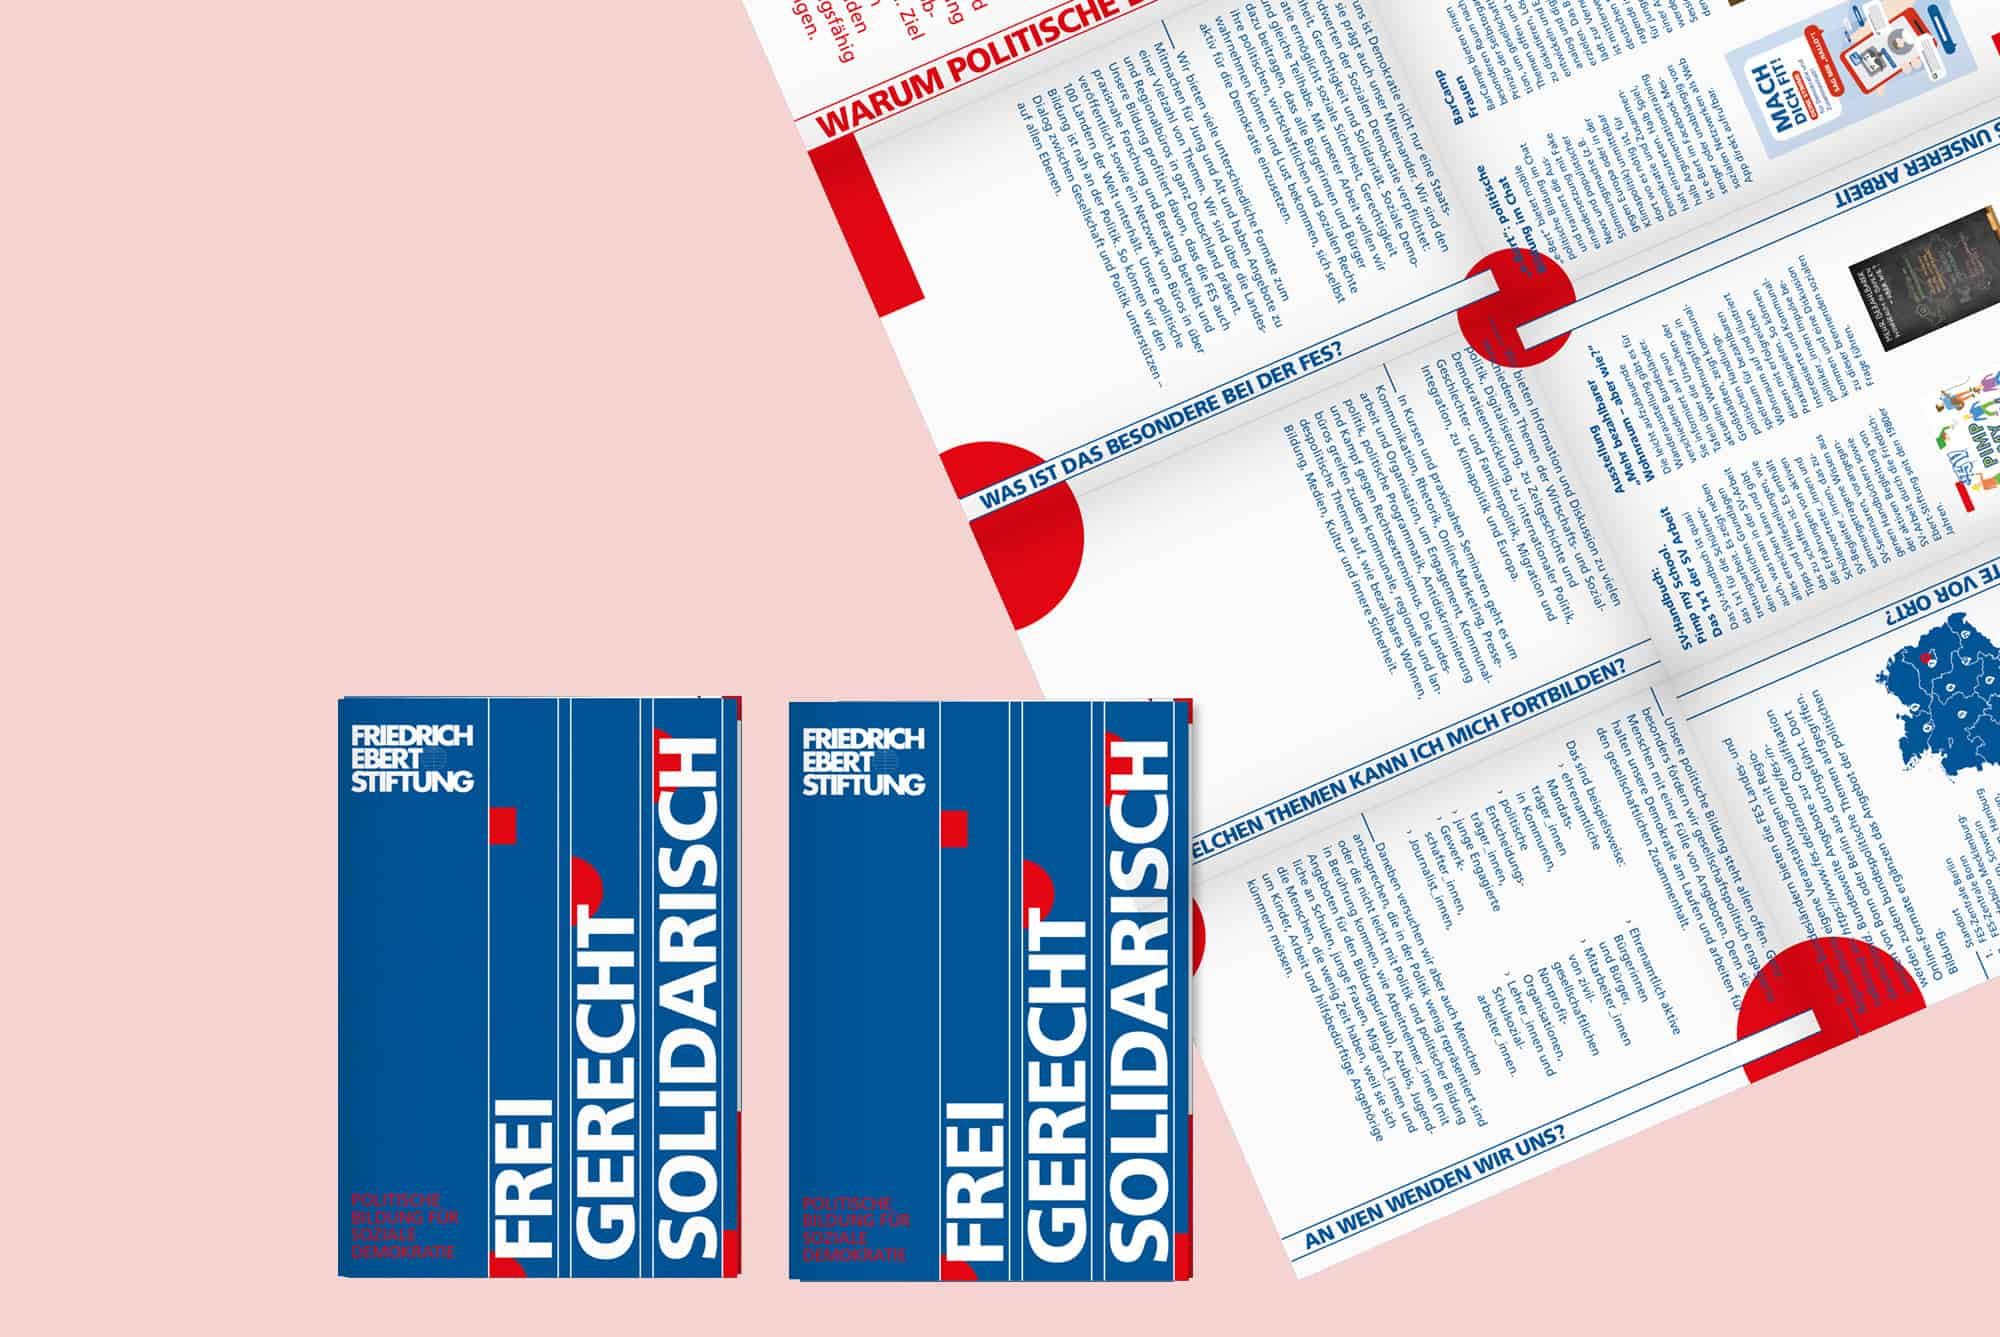 FES Politische Bildung Editorial